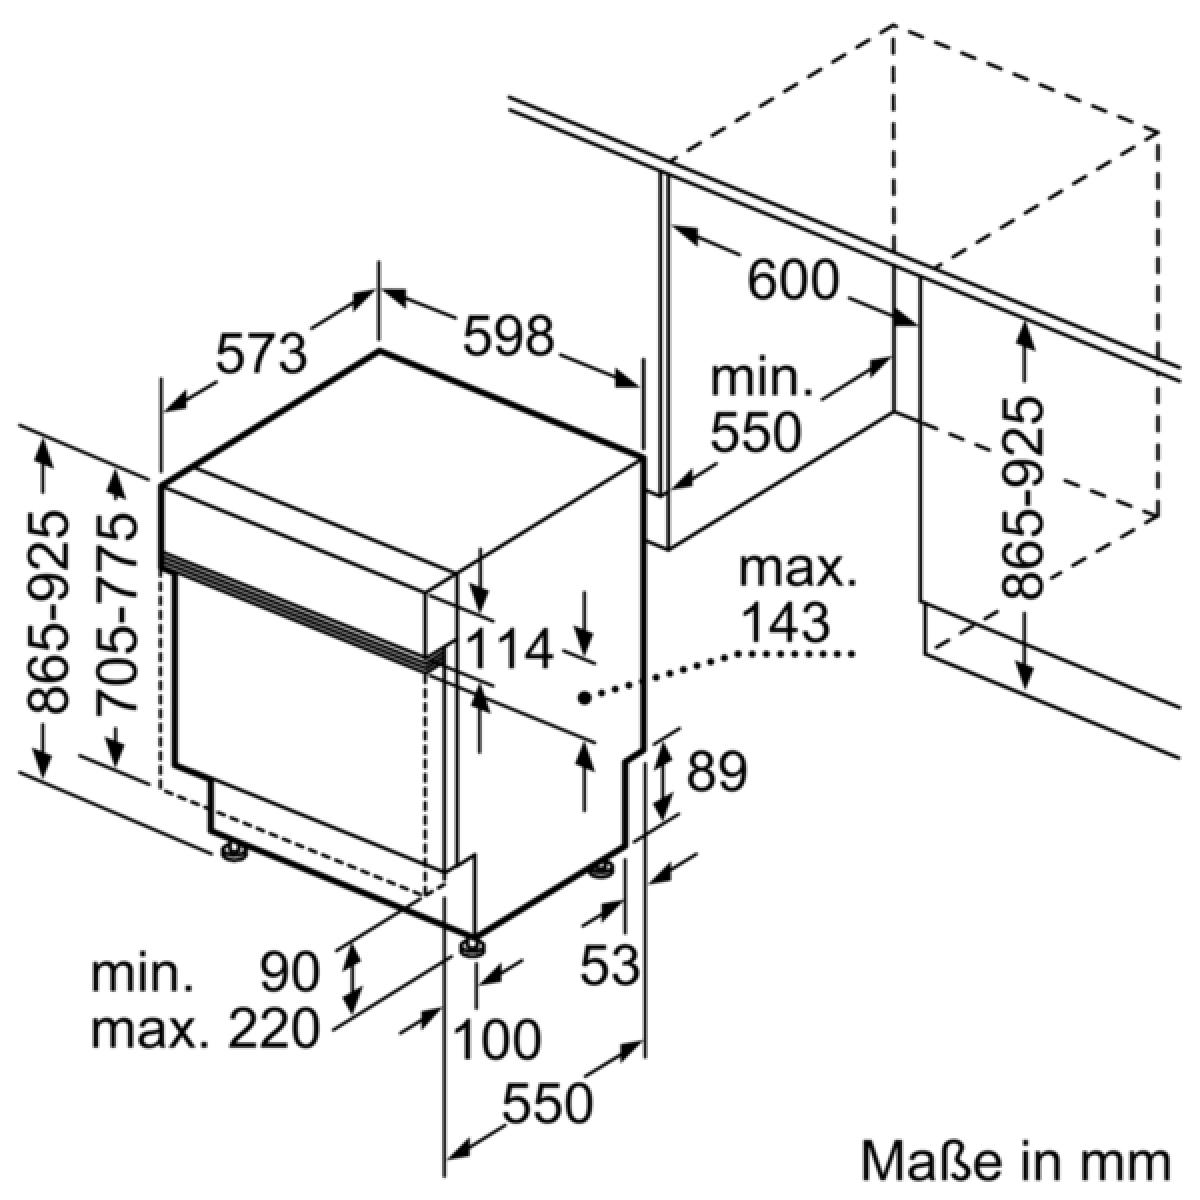 neff gh4603mn s423m60s3e geschirrsp ler 60 cm integrierbar edelstahl xxl g nstig kaufen. Black Bedroom Furniture Sets. Home Design Ideas